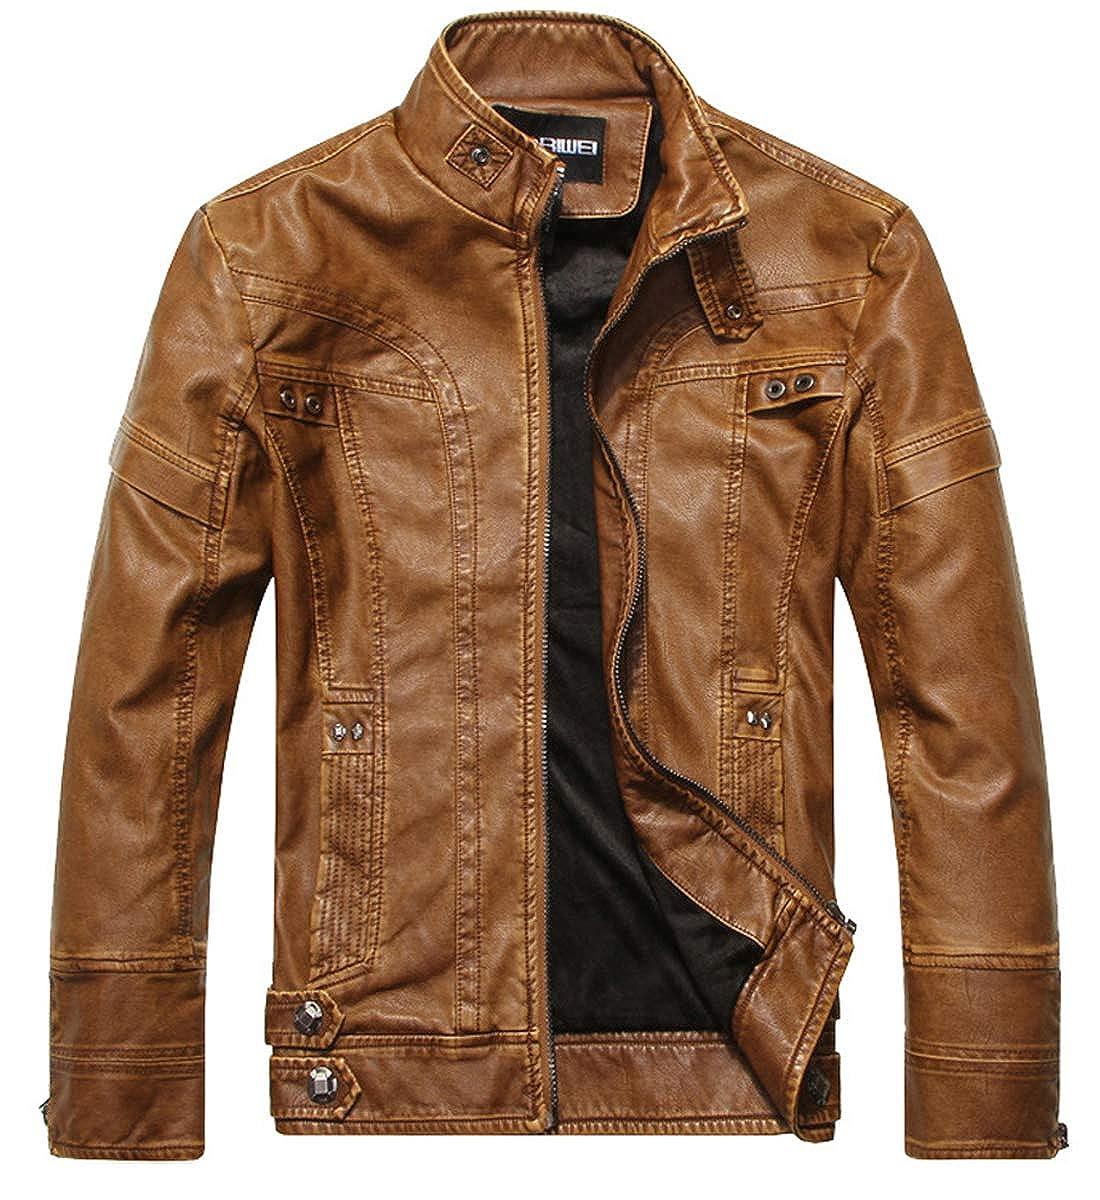 WULFUL Men's Vintage Stand Collar Leather Jacket Motorcycle PU Faux Leather Jacket Fleece Lined Winter Outwear